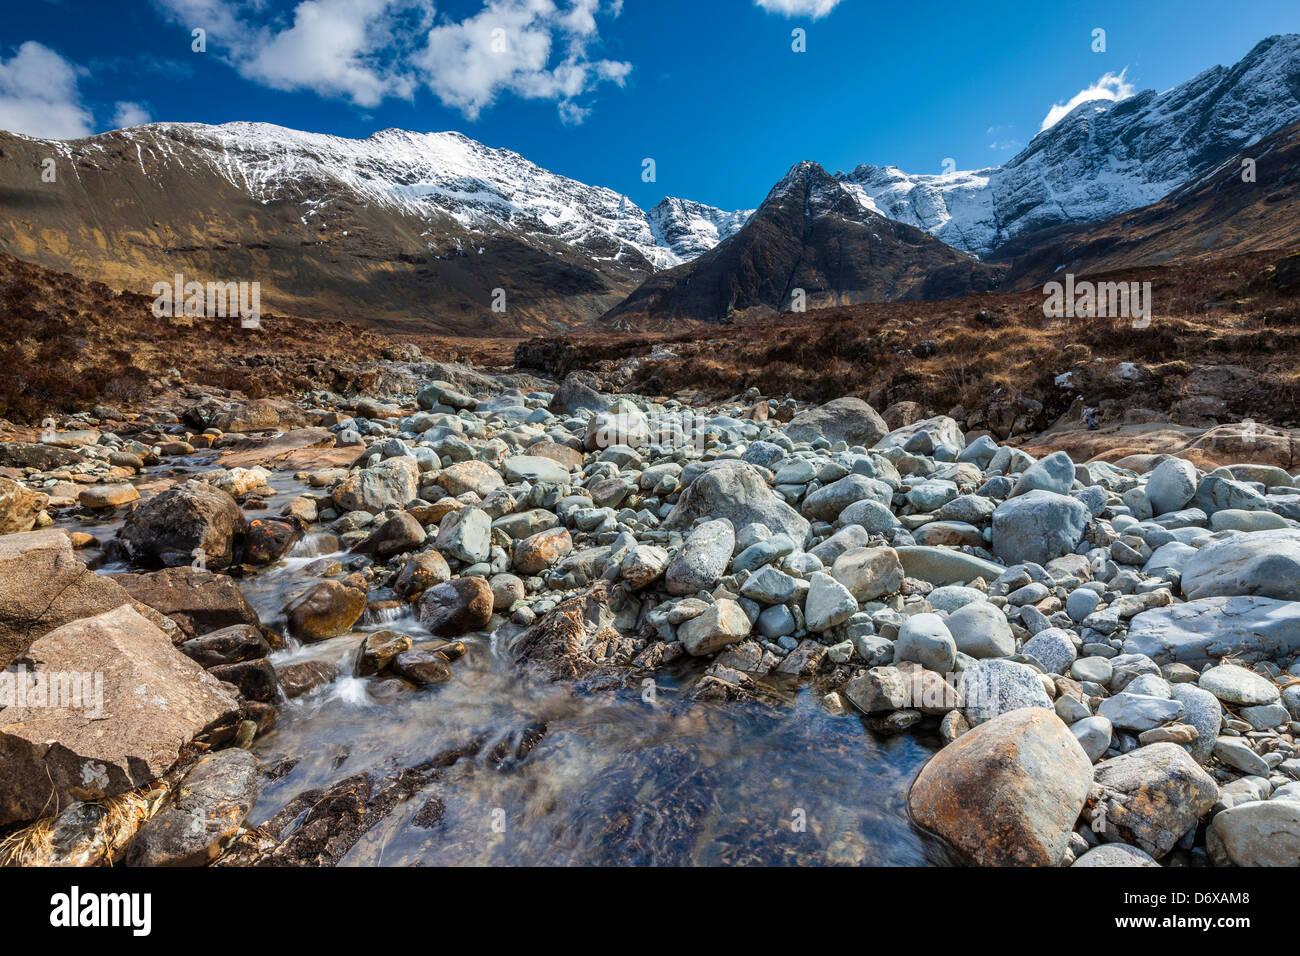 The Cuillin Hills from beside the Allt Coir a Mhadhaidh on the Fairy Pools walk, Glen Brittle, Isle of Skye, Scotland - Stock Image